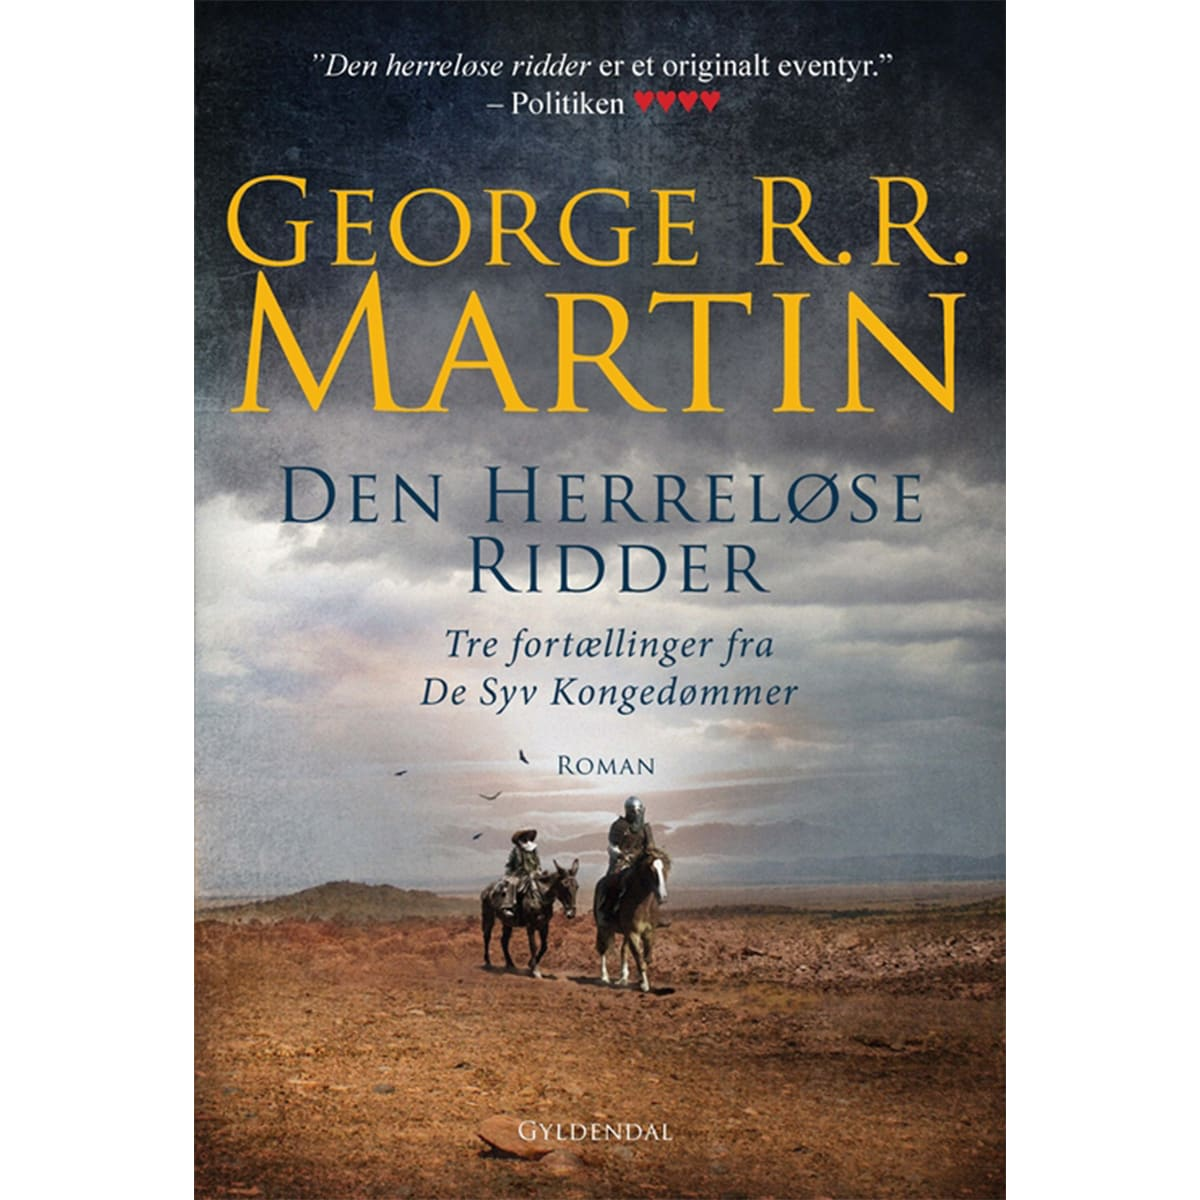 Af George R.R. Martin